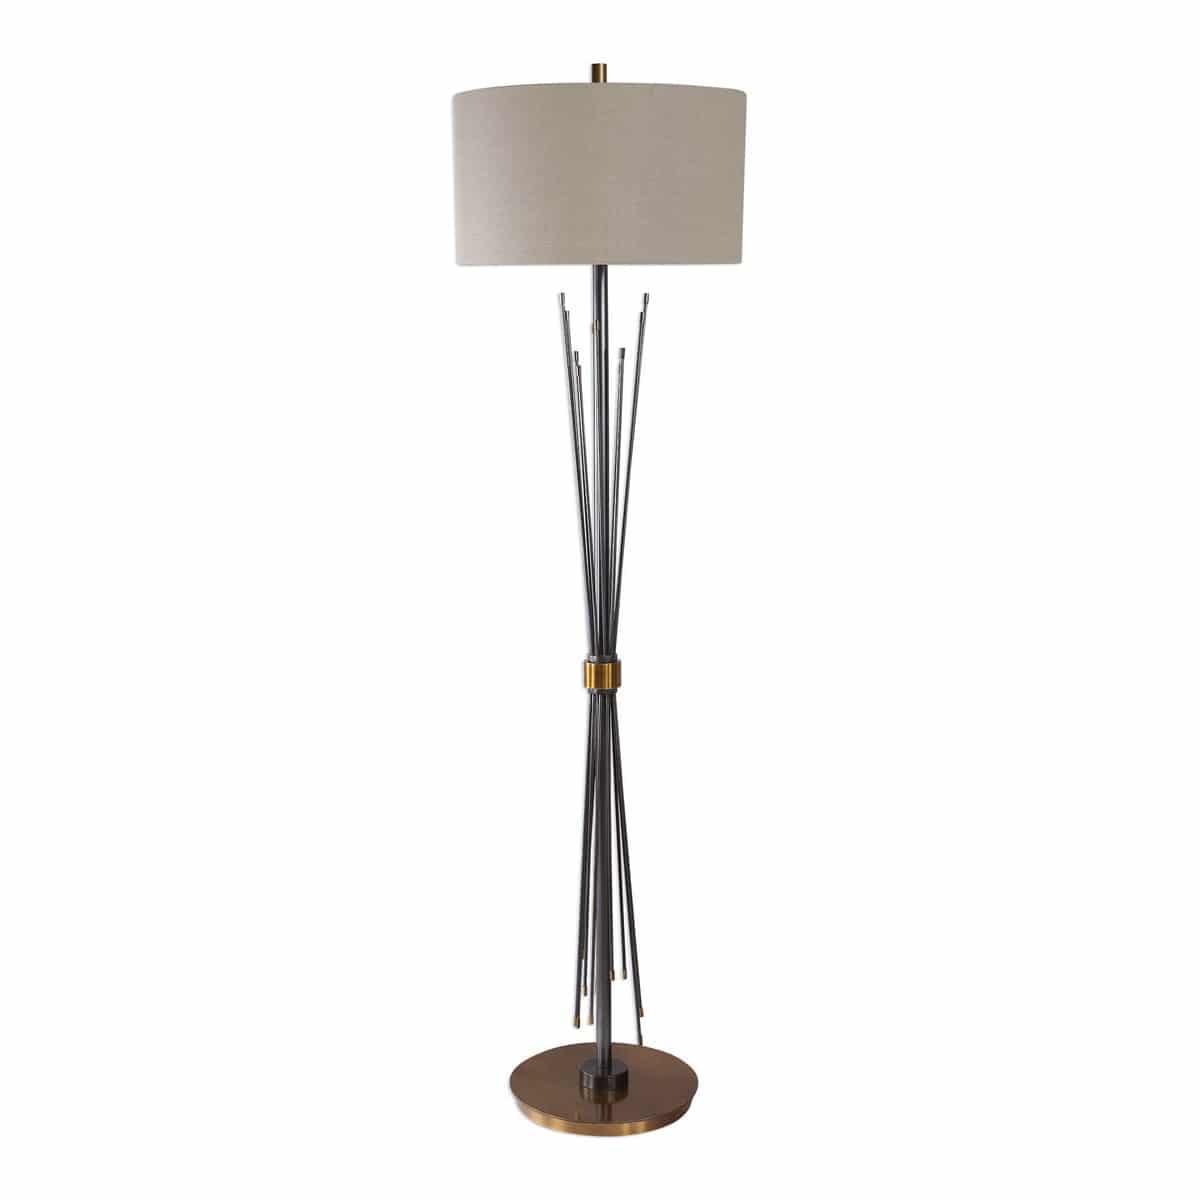 Poloma Floor Lamp santa barbara design center -